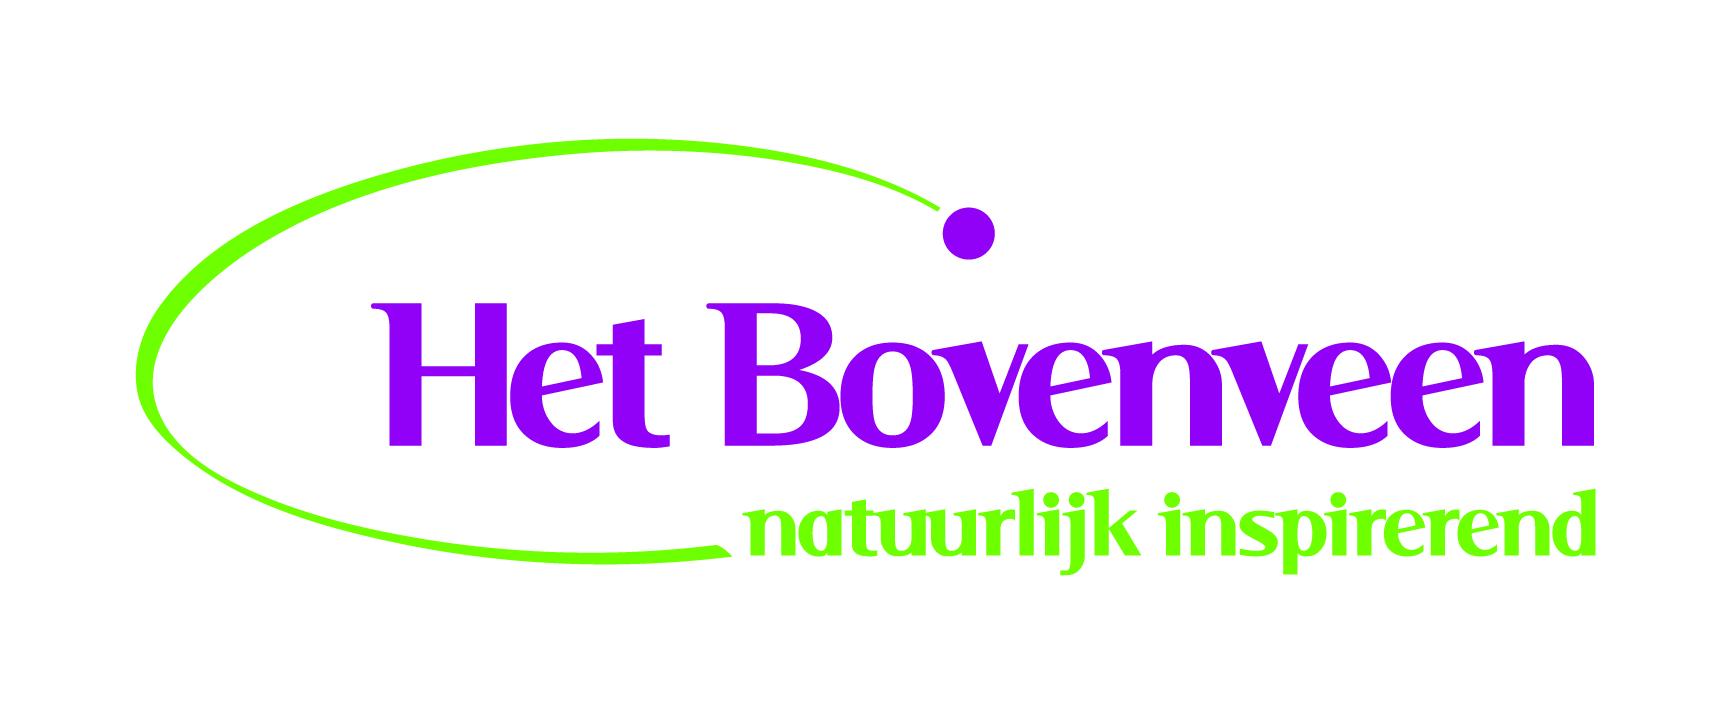 Het Bovenveen Logo